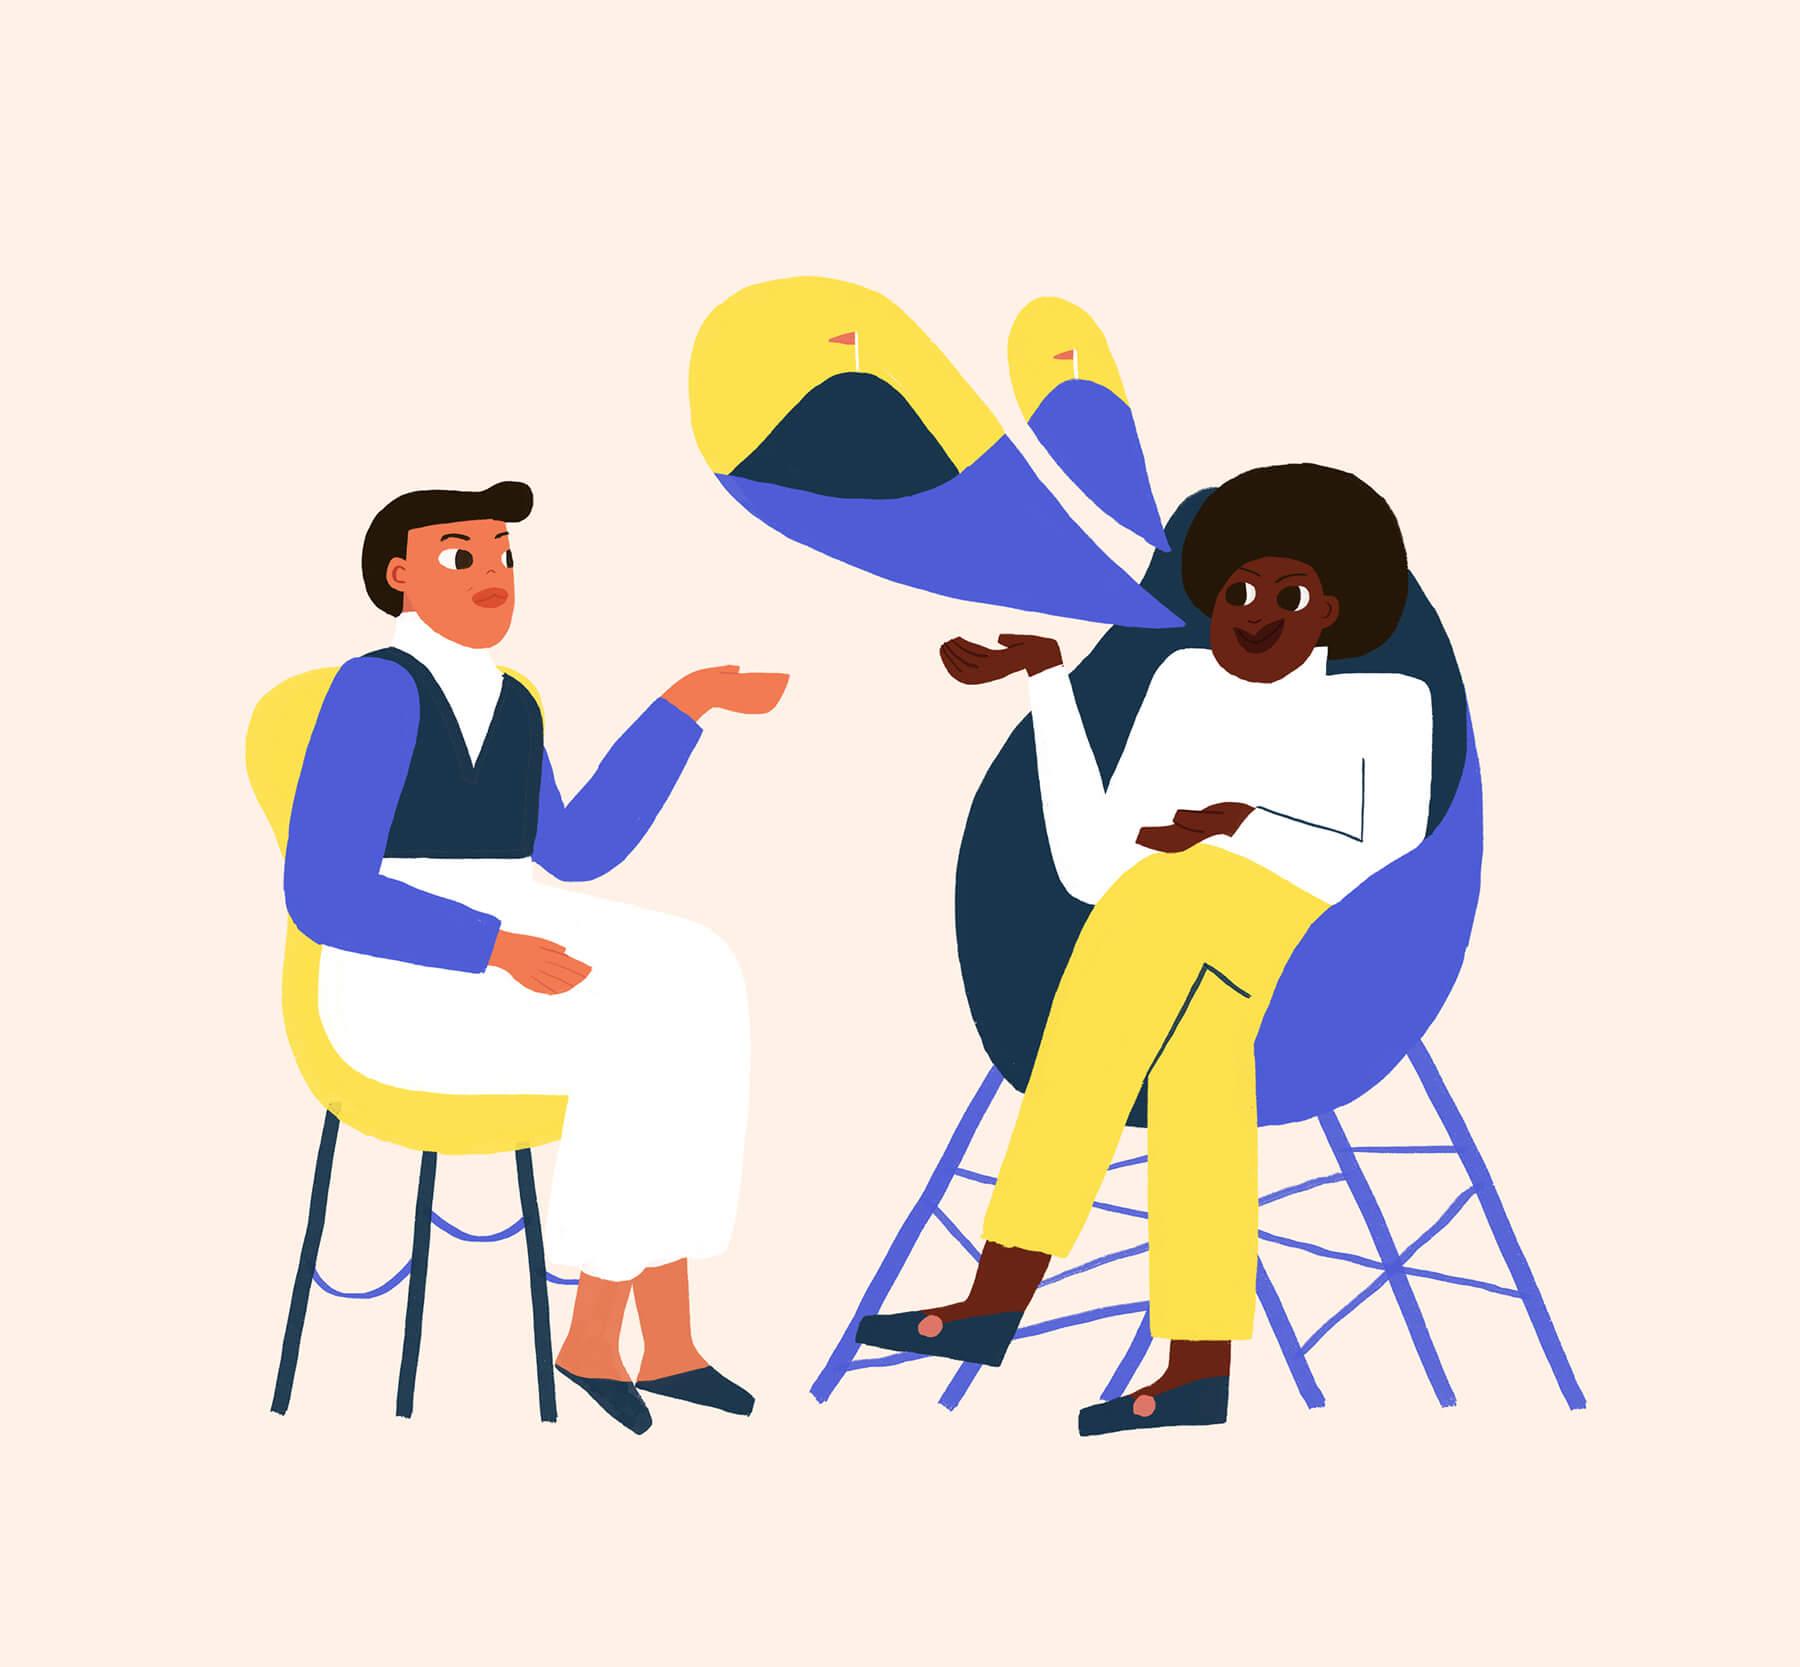 mentorship-women-goals-talking-mountain-illustration-violeta-noy-2